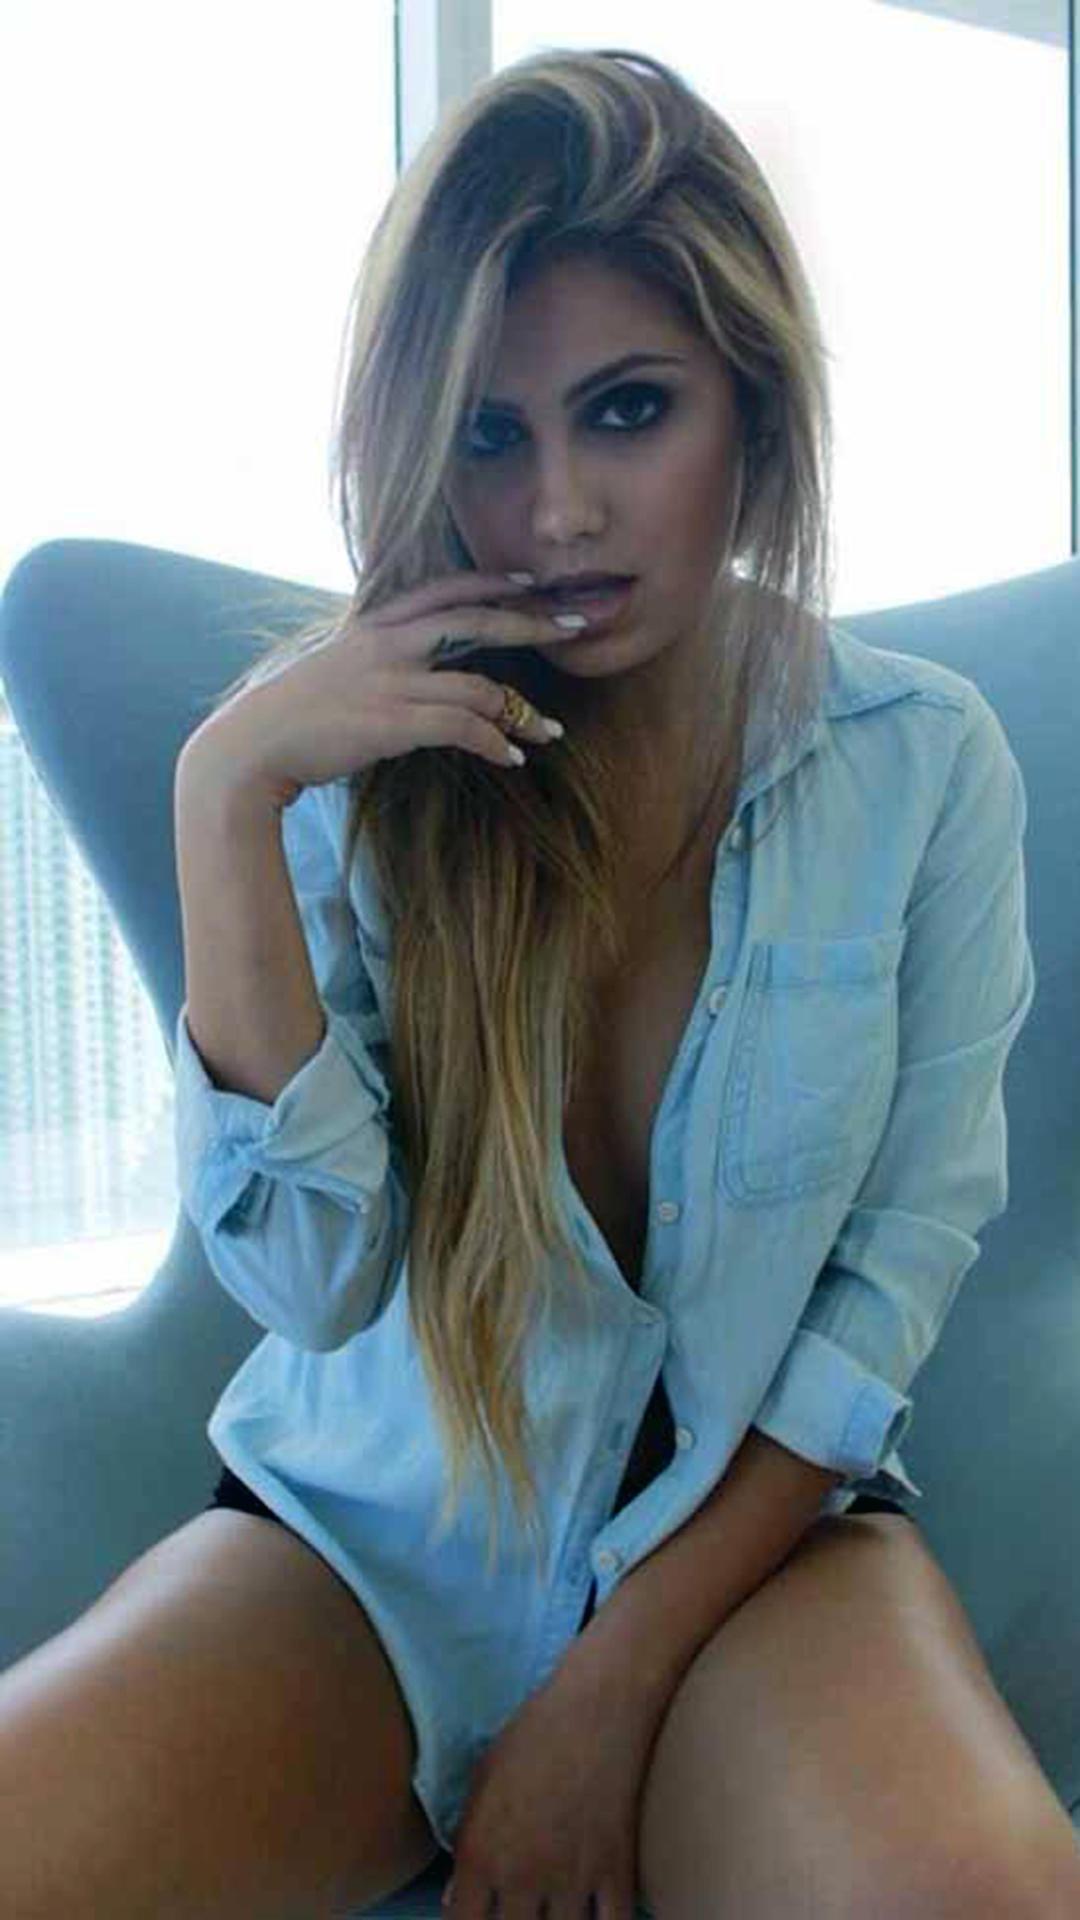 ICloud Demi Rose nudes (42 photo), Tits, Cleavage, Twitter, legs 2015